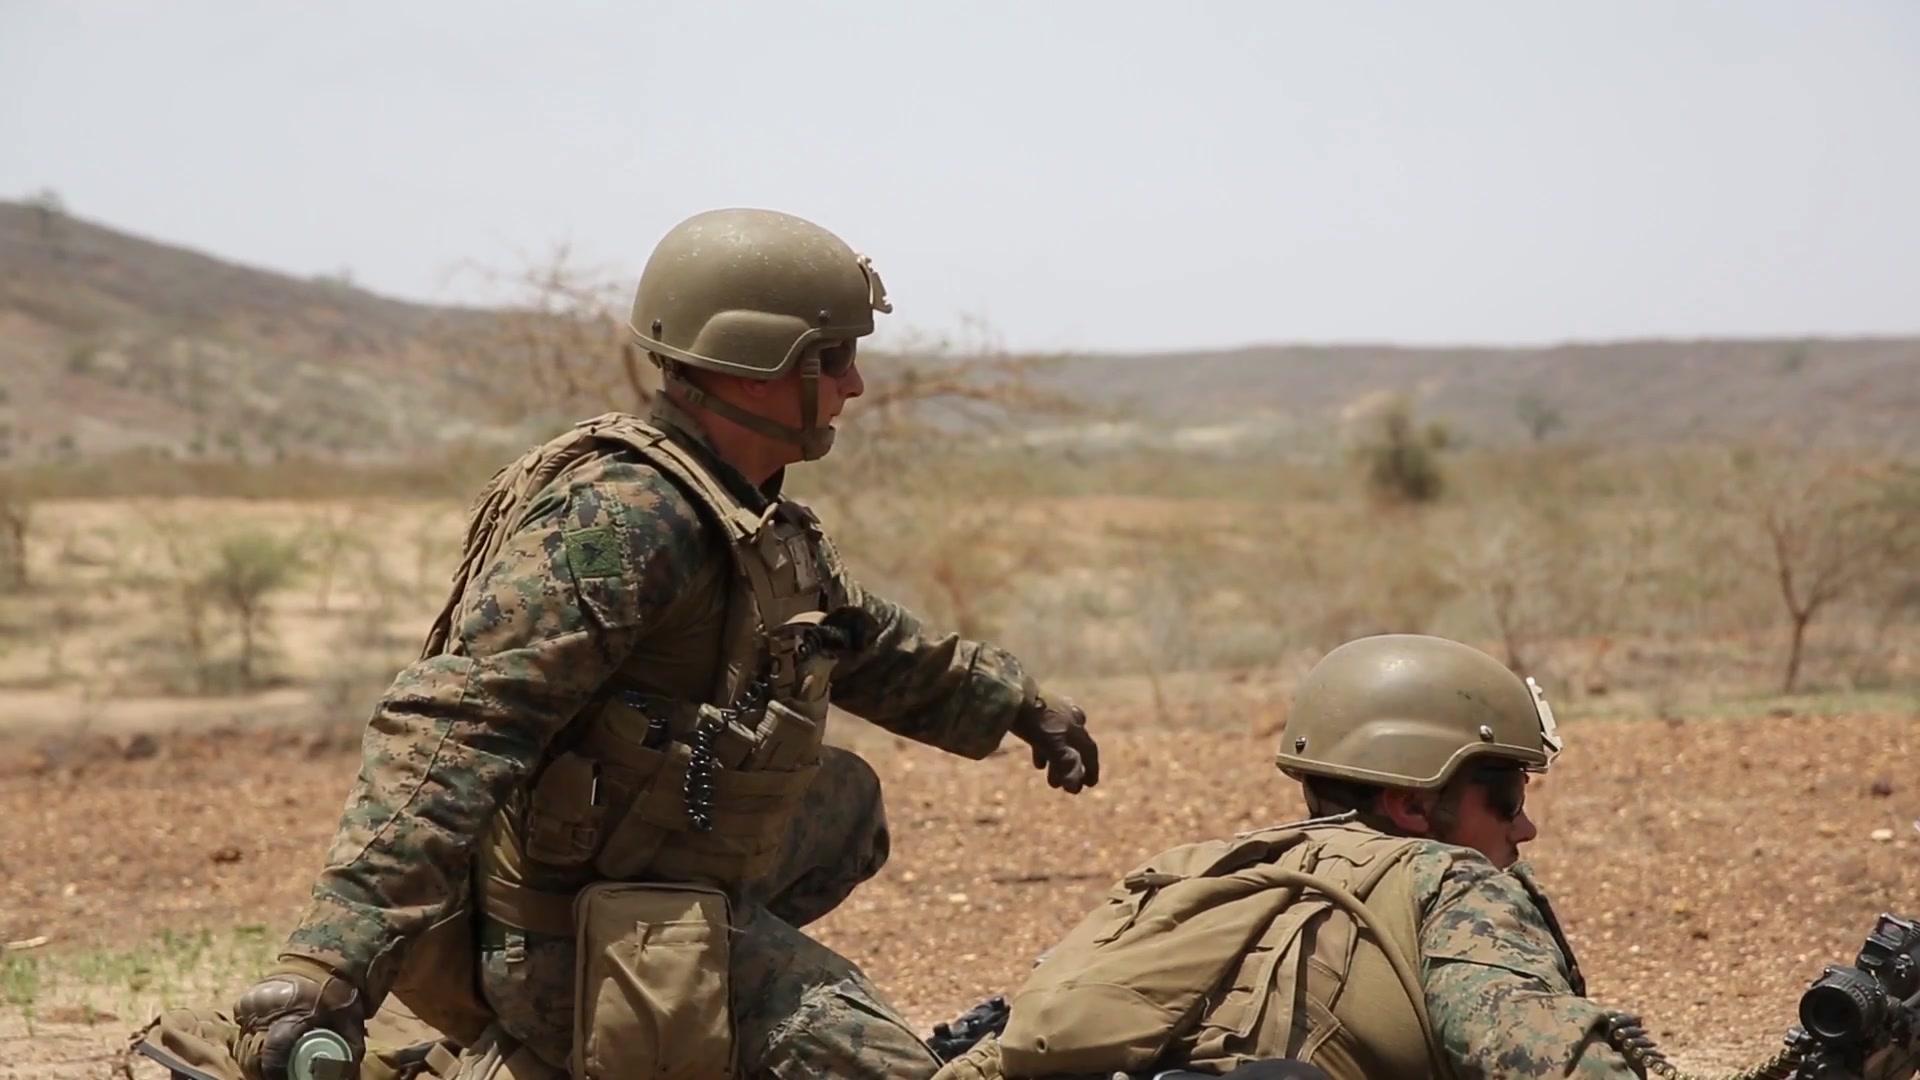 Italian Troops • Mortar Team Firing • Exercise Steadfast Defender 2021